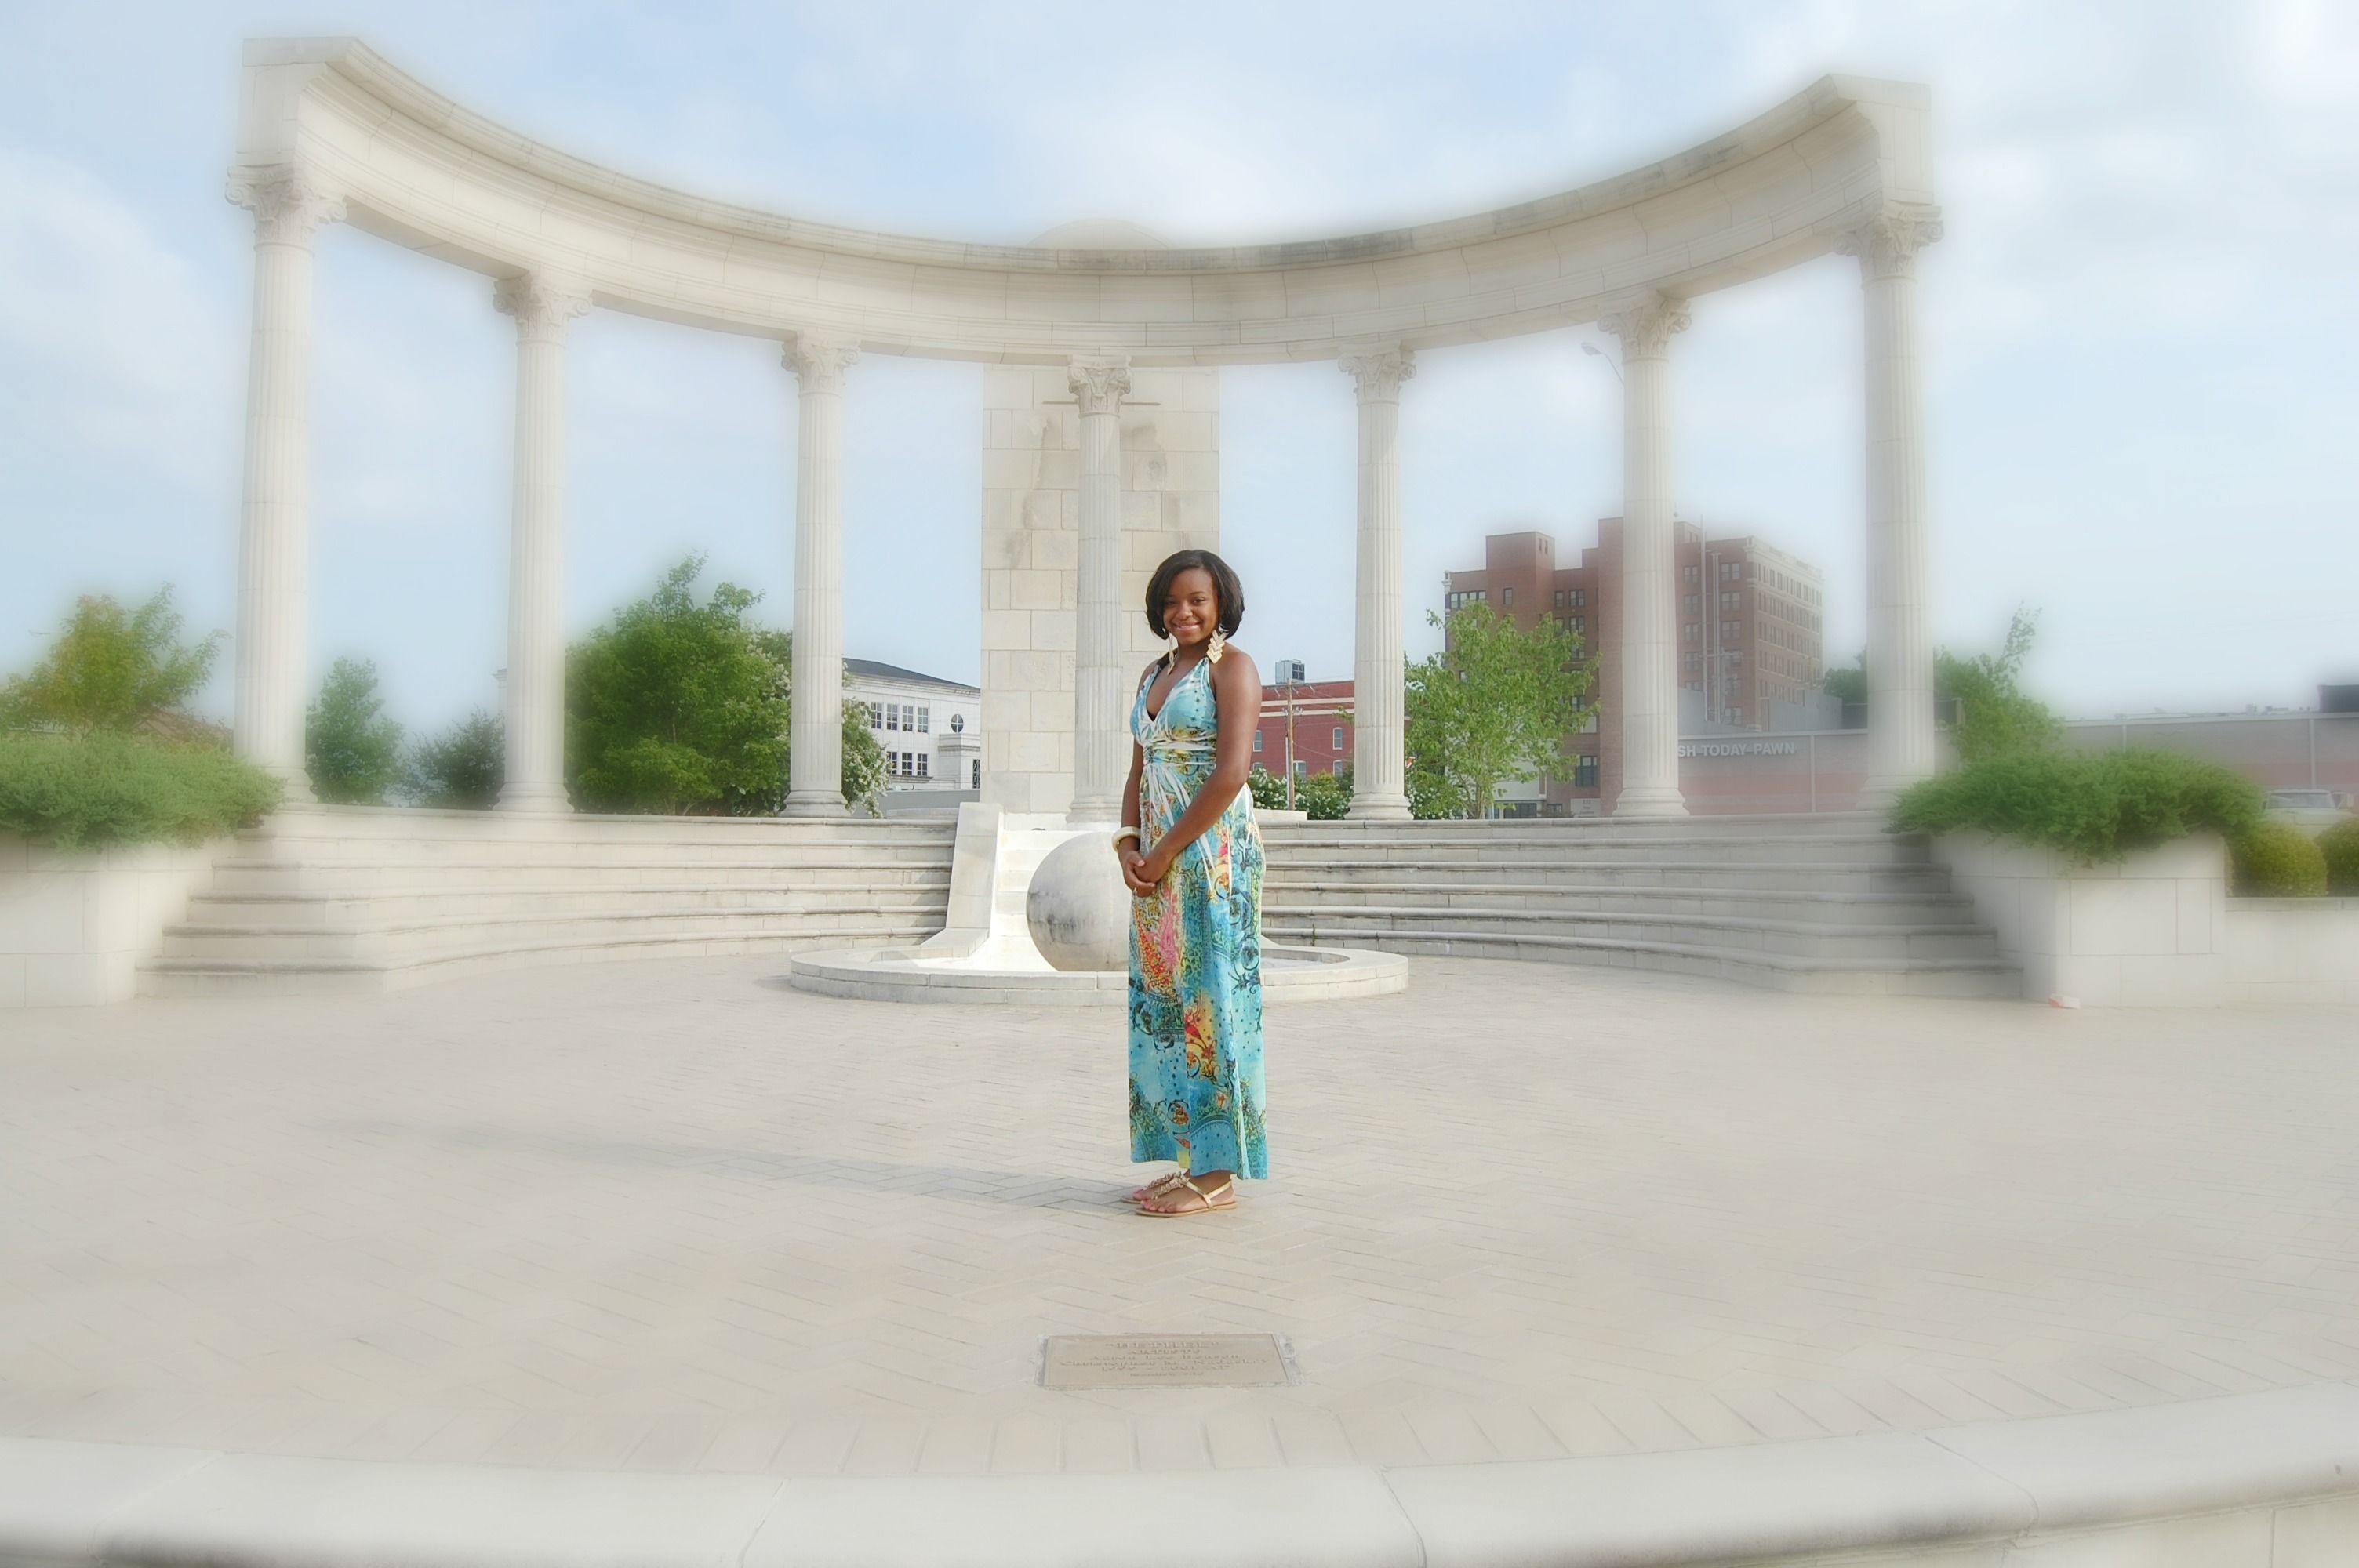 07-03-12 Monument/Jackson tn